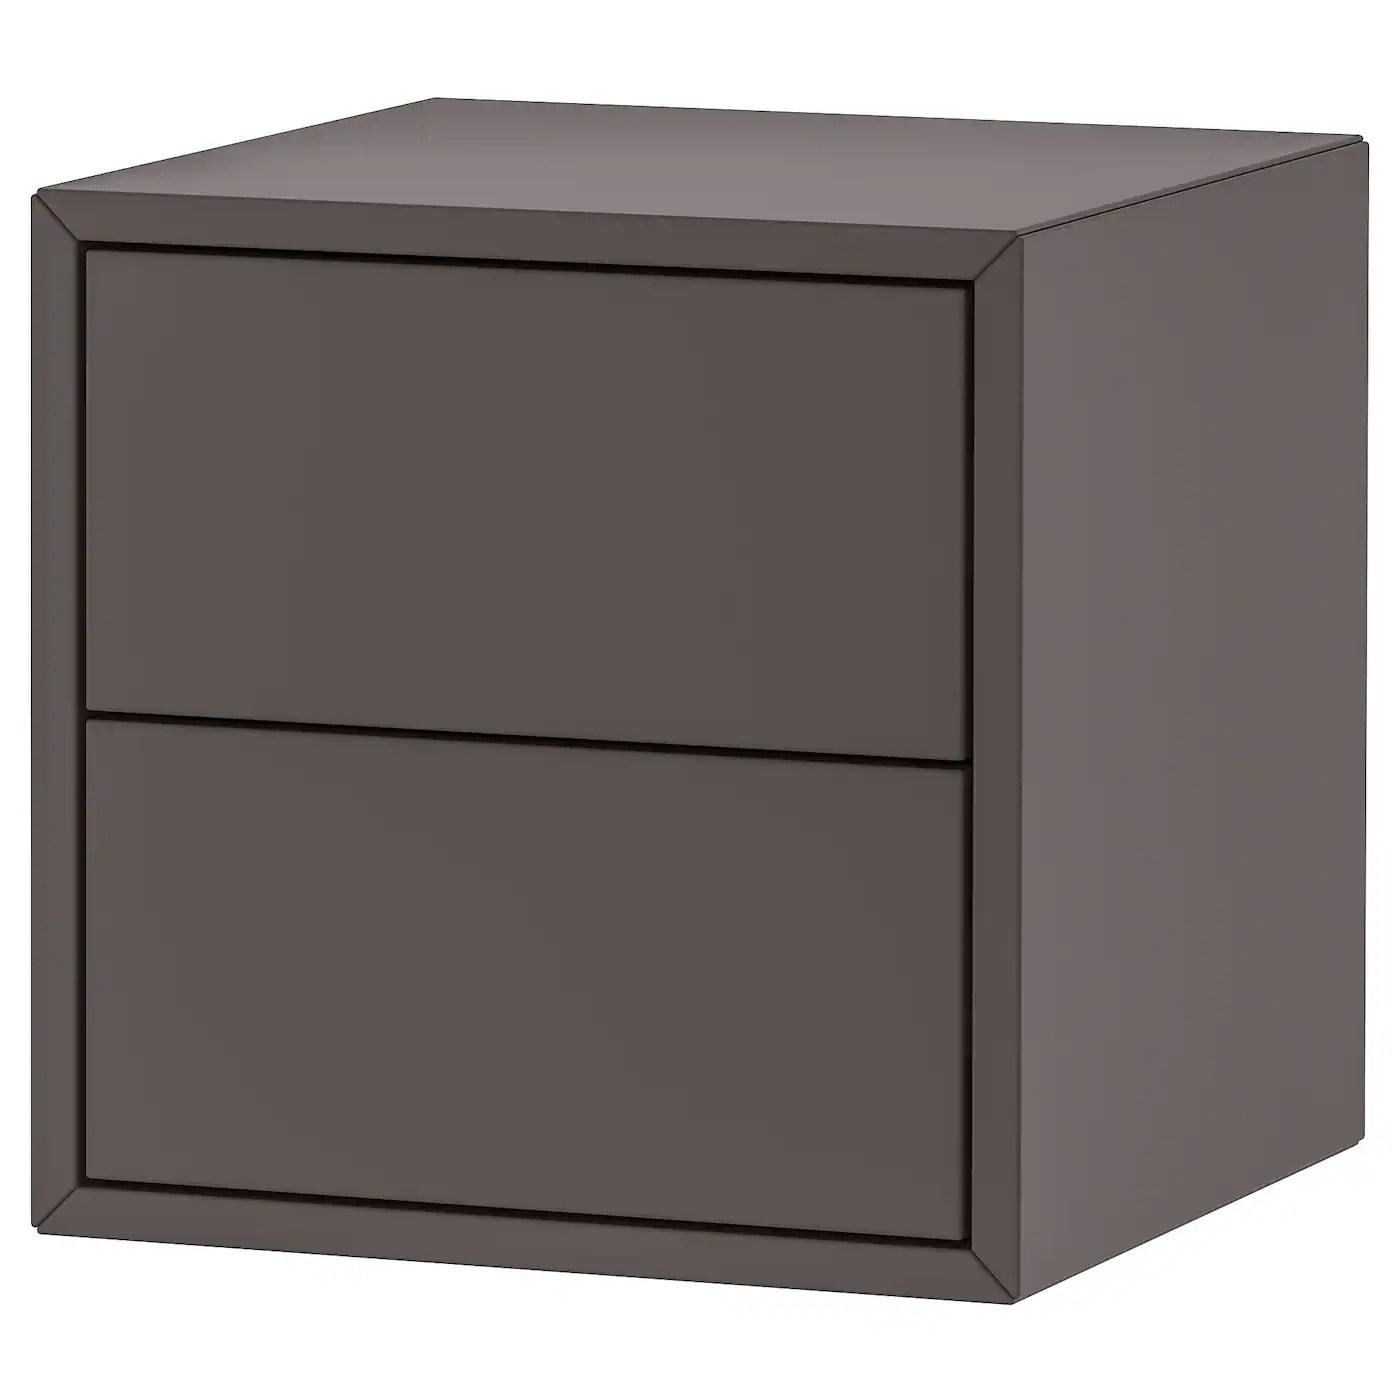 eket rangement 2 tiroirs gris fonce 35x35x35 cm